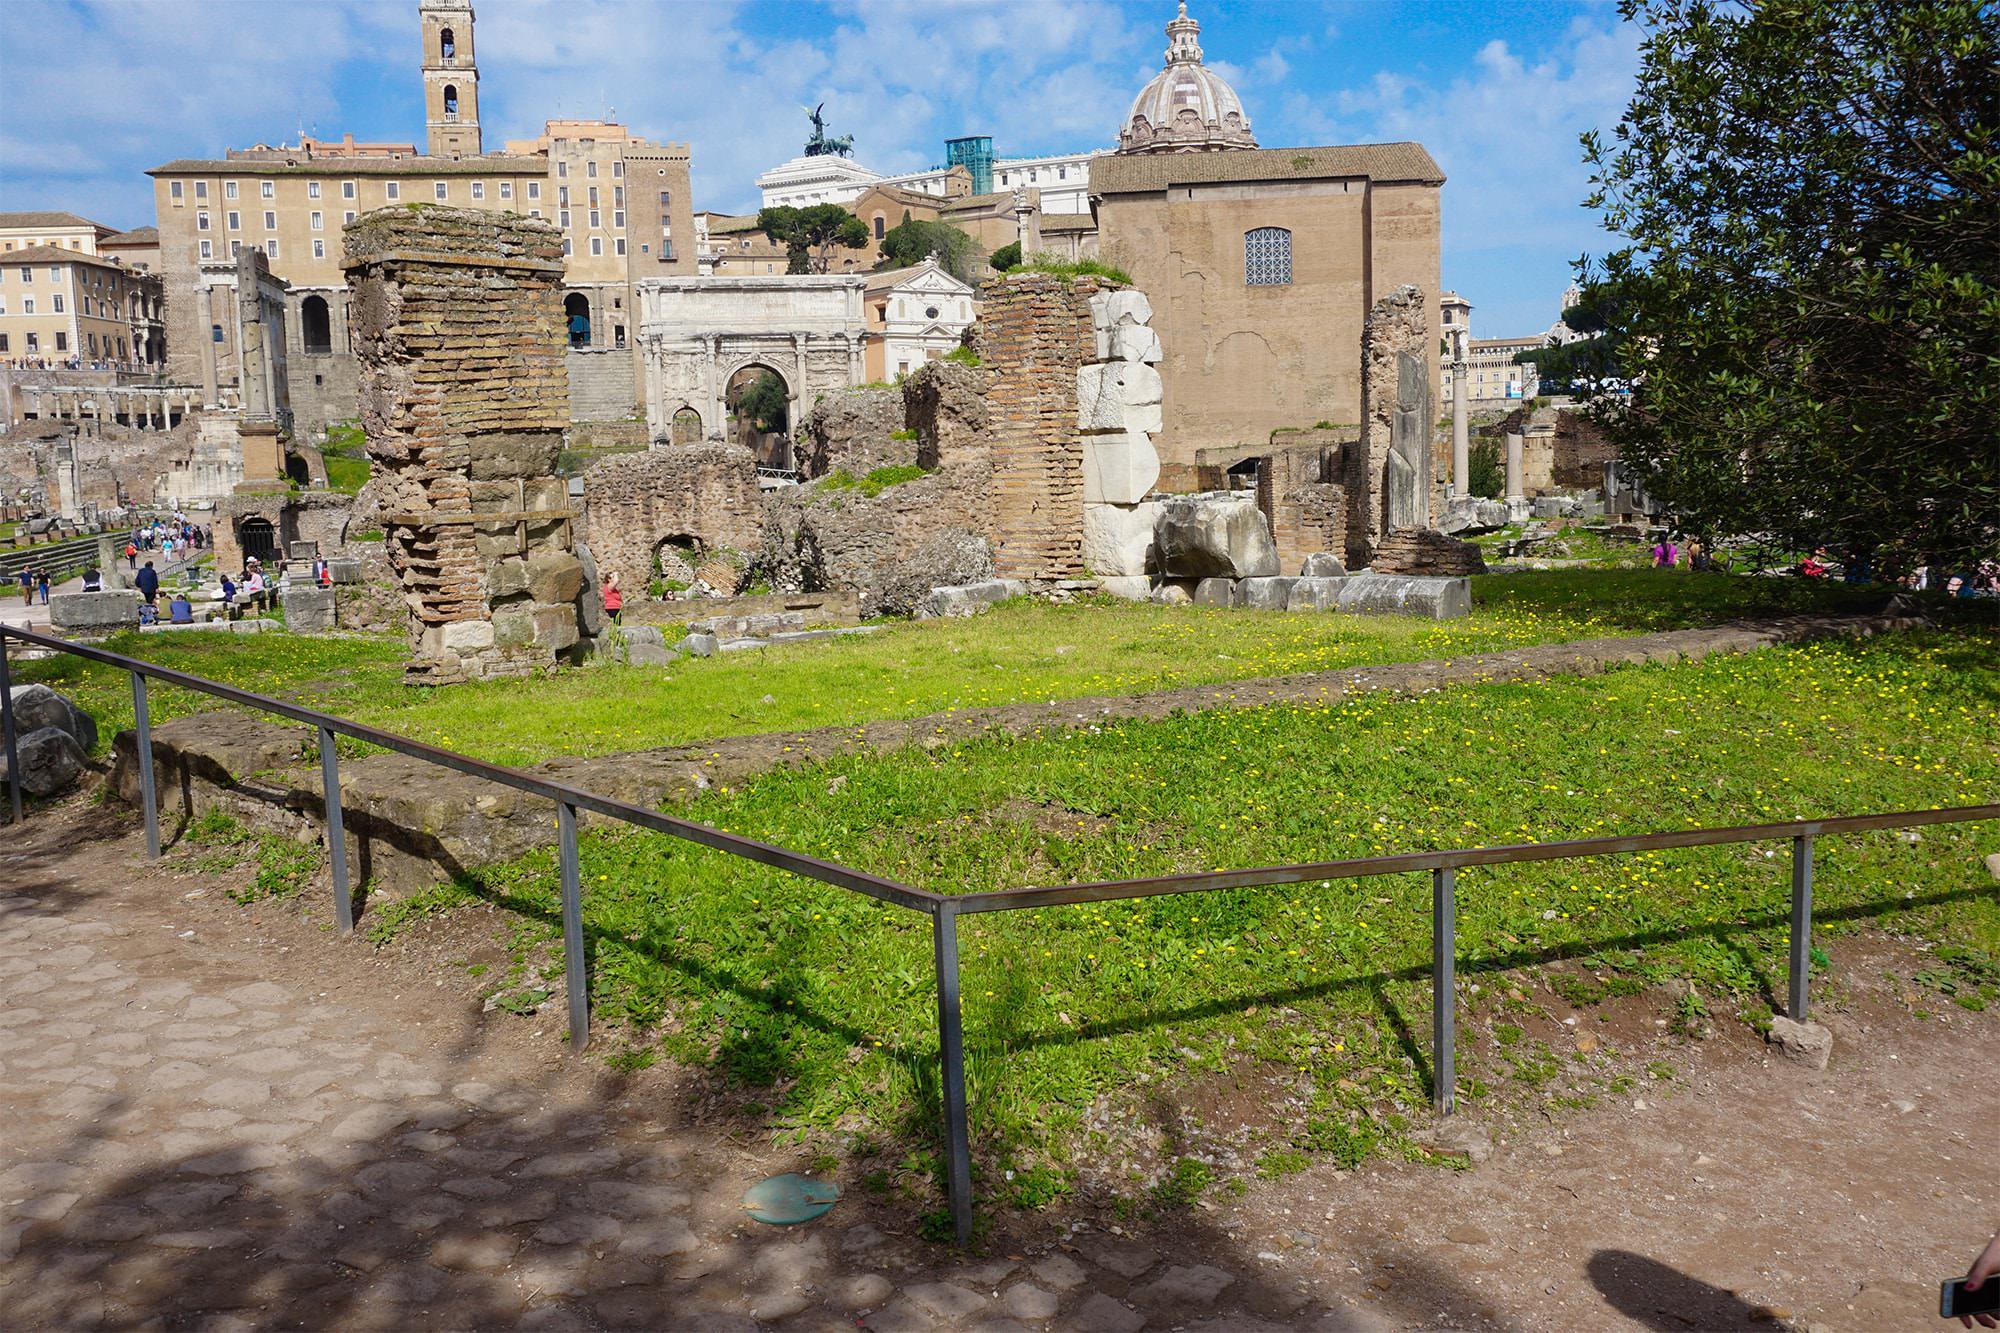 Regia parco archeologico colosseo